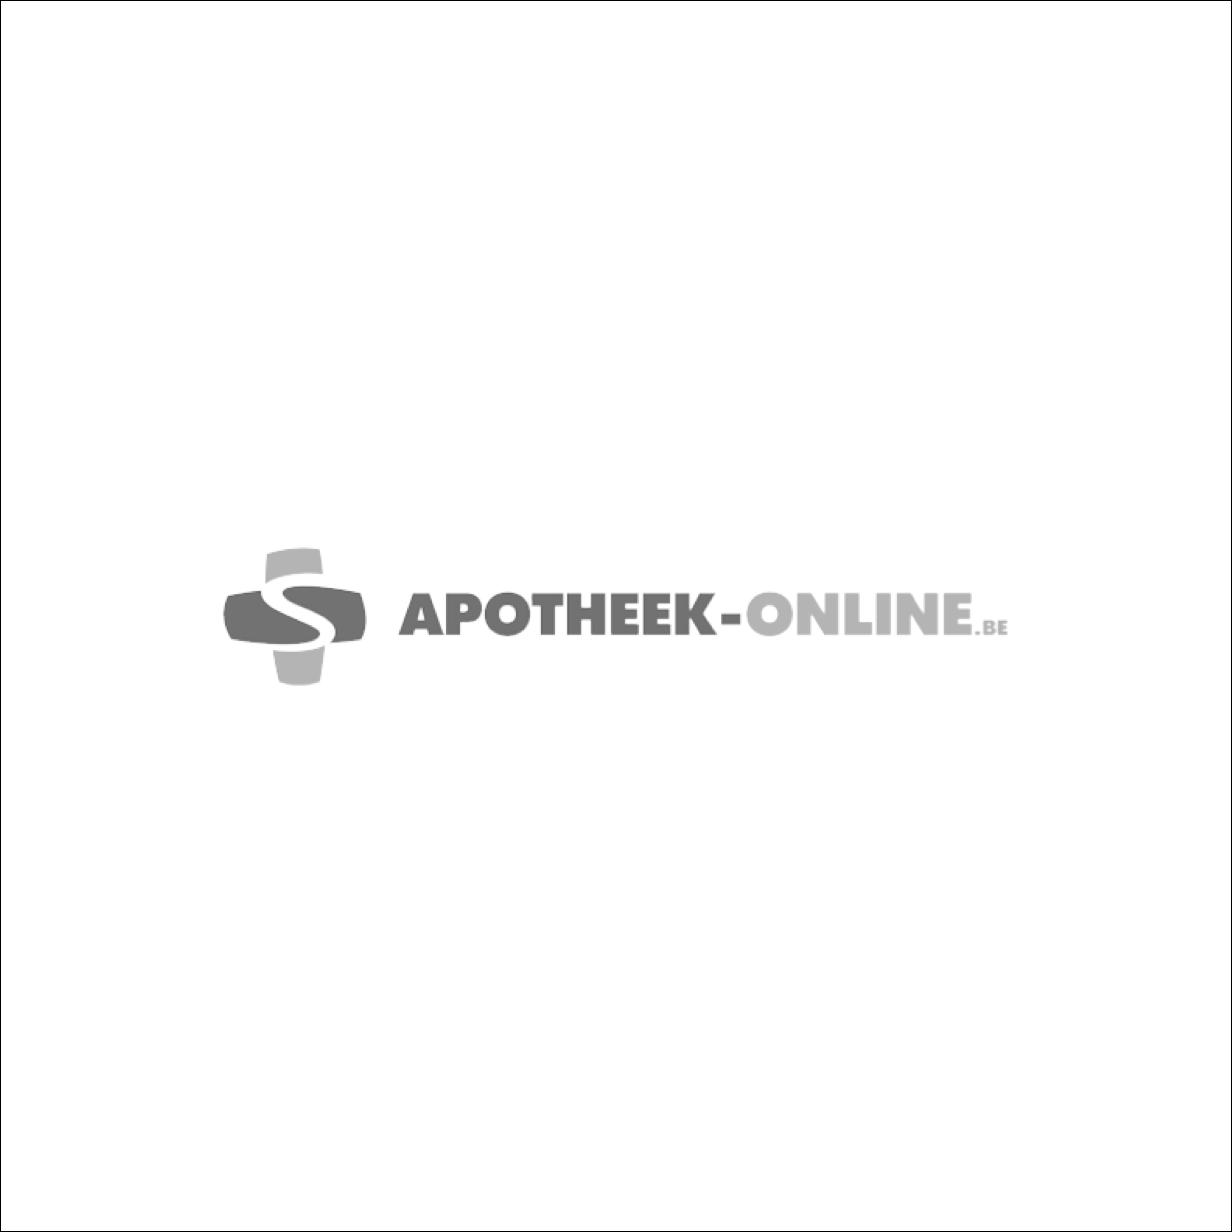 TG GANT 100% COTON GRAND 9-10 (PAIRE) 24752